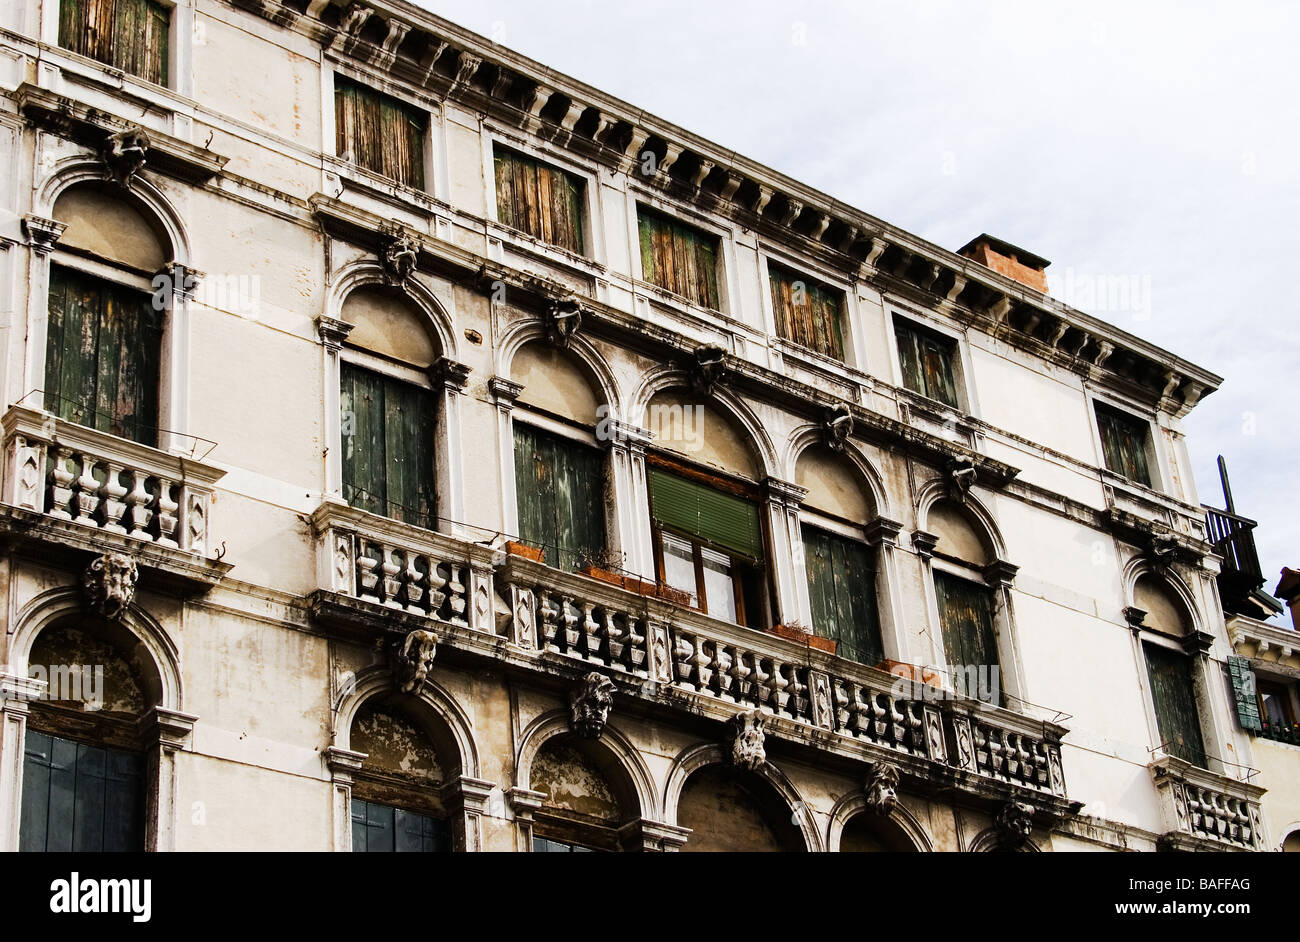 Old Venetian building Venice Italy - Stock Image